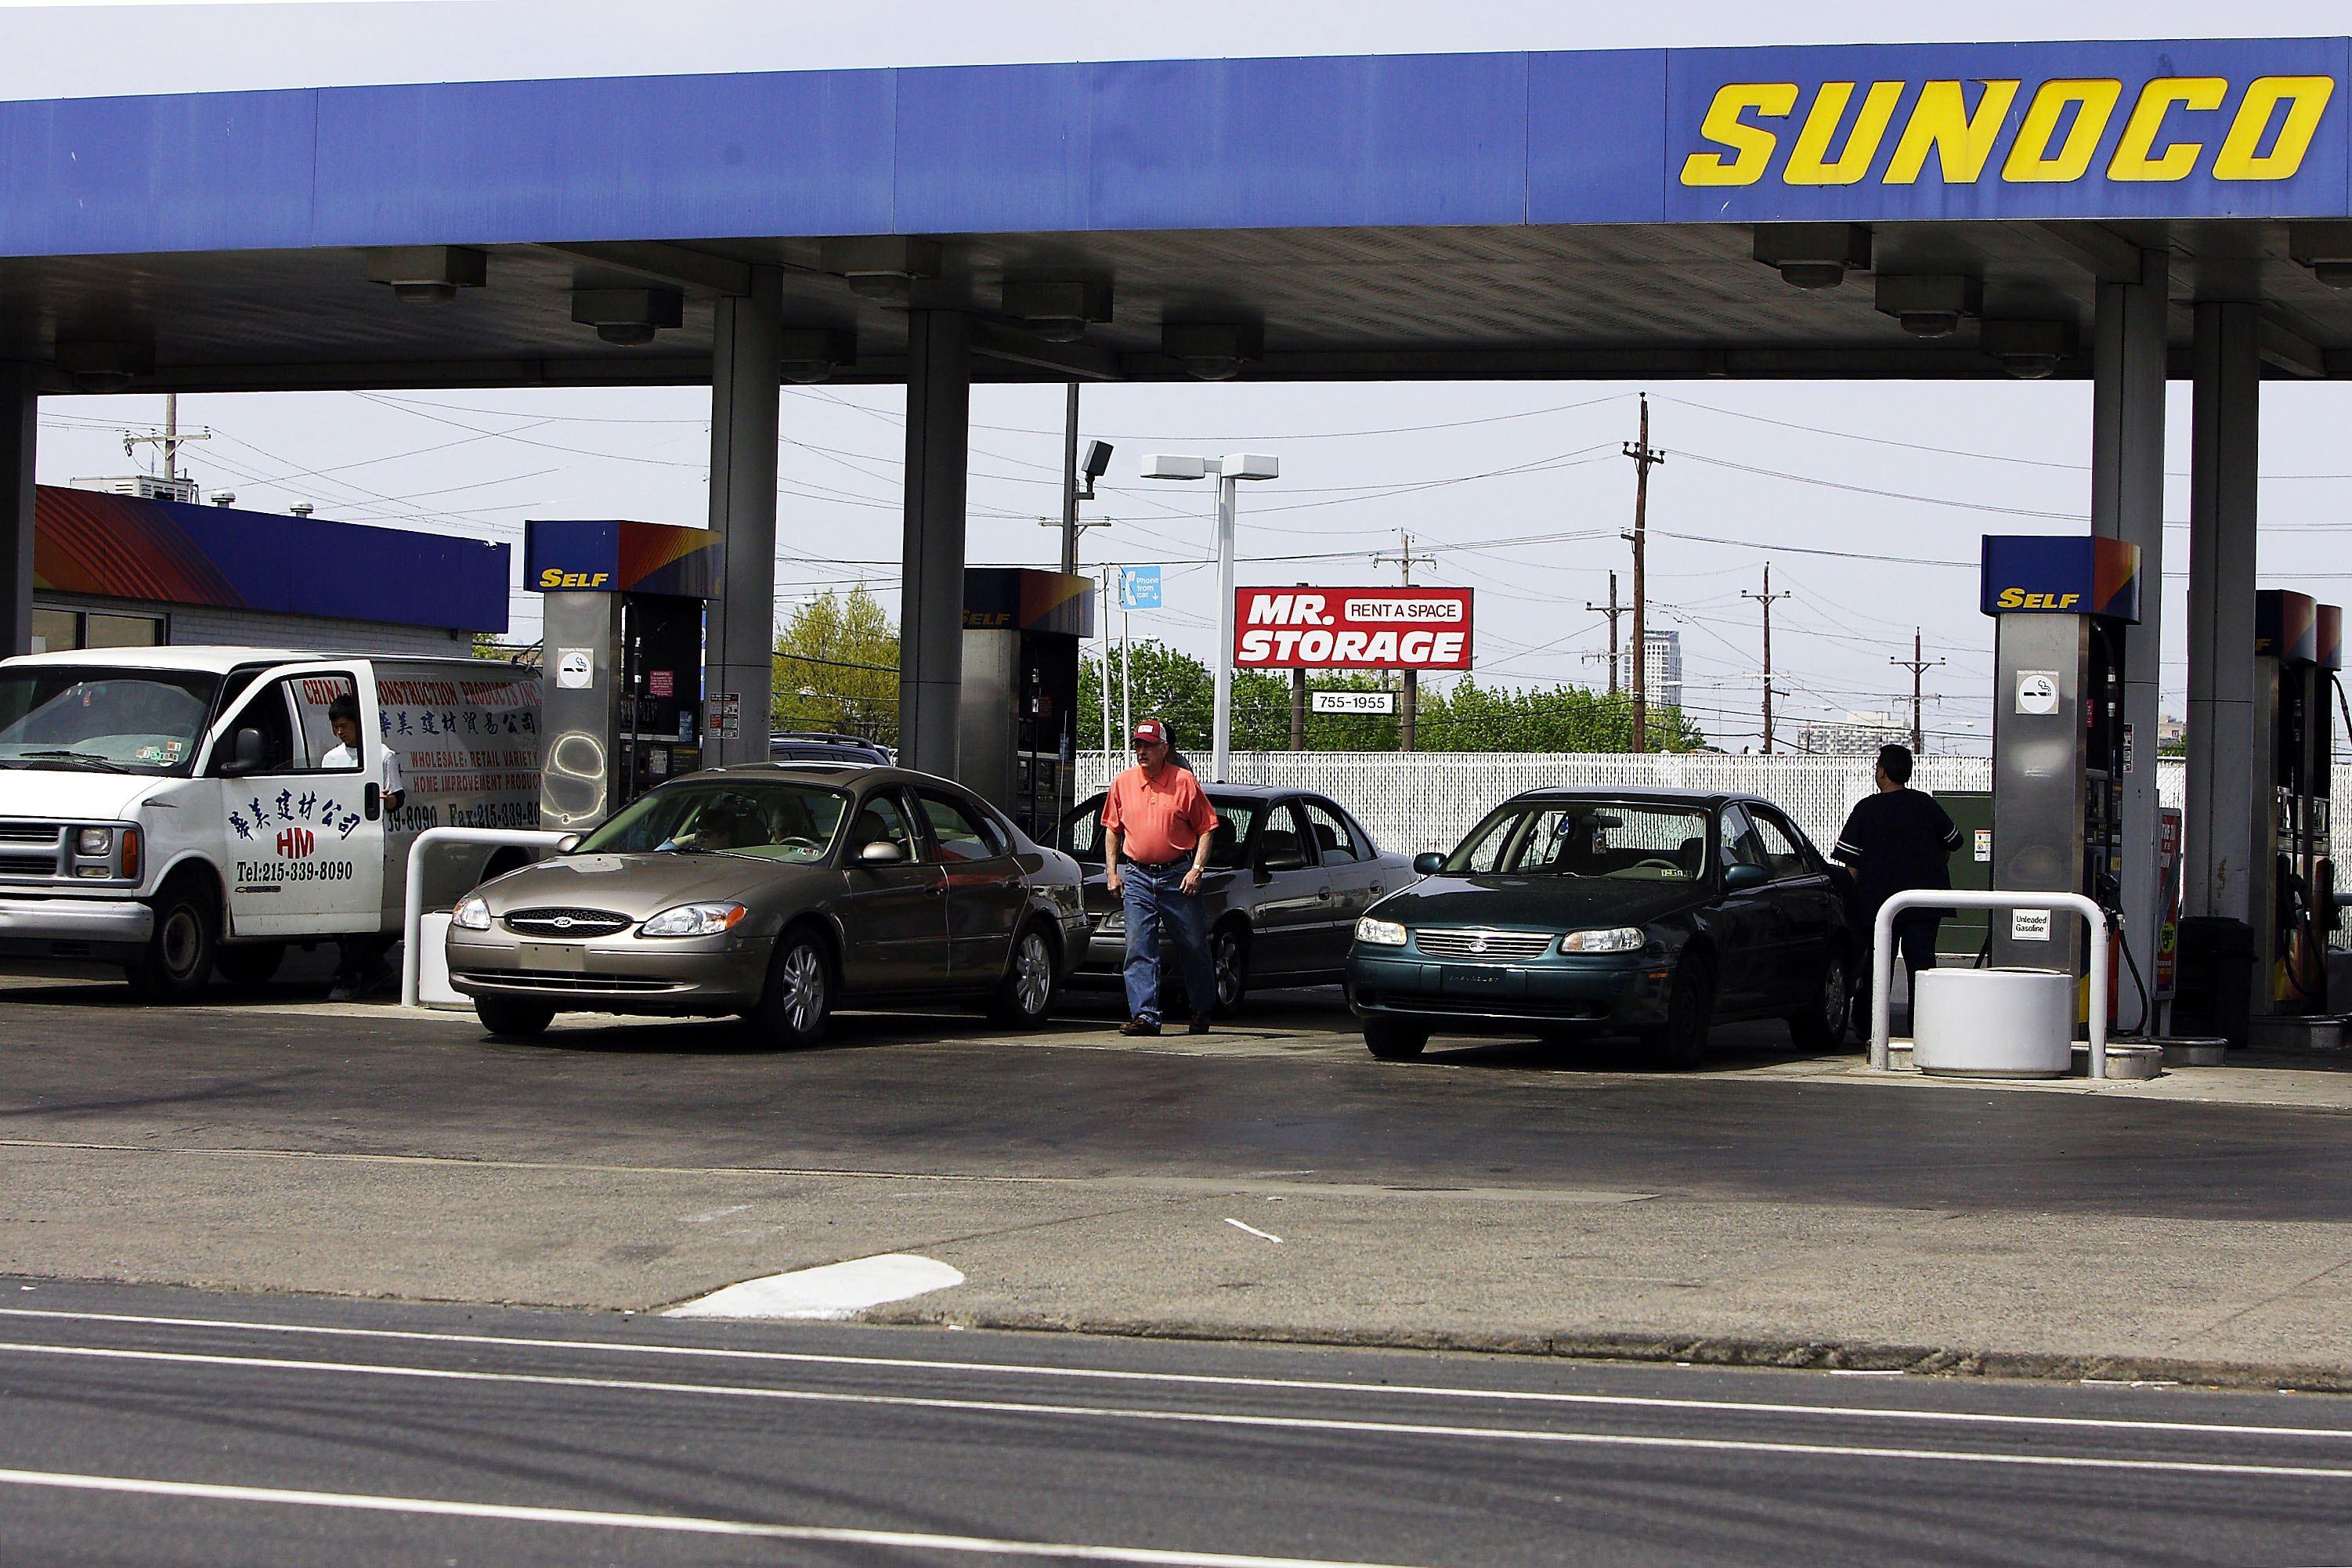 PHILADELPHIA - APRIL 21: Consumers fill up their tanks at a Sunoco gas station on April 21, 2006 in Philadelphia, Pennsylvania.